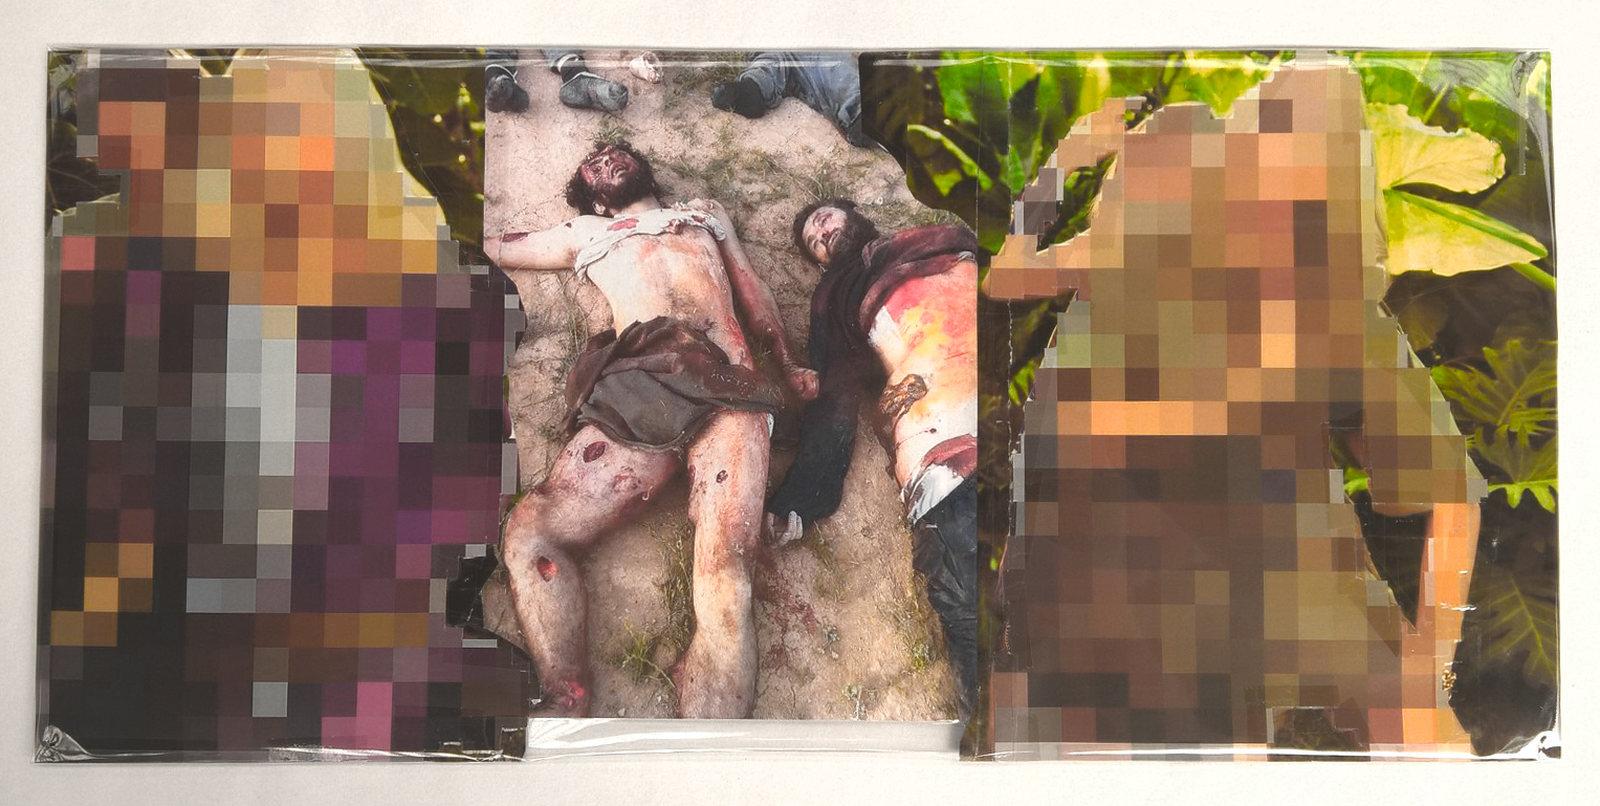 Pixel-Collage nº54, 2016, Prints, tape, transparent sheet, 28,5x61 cm